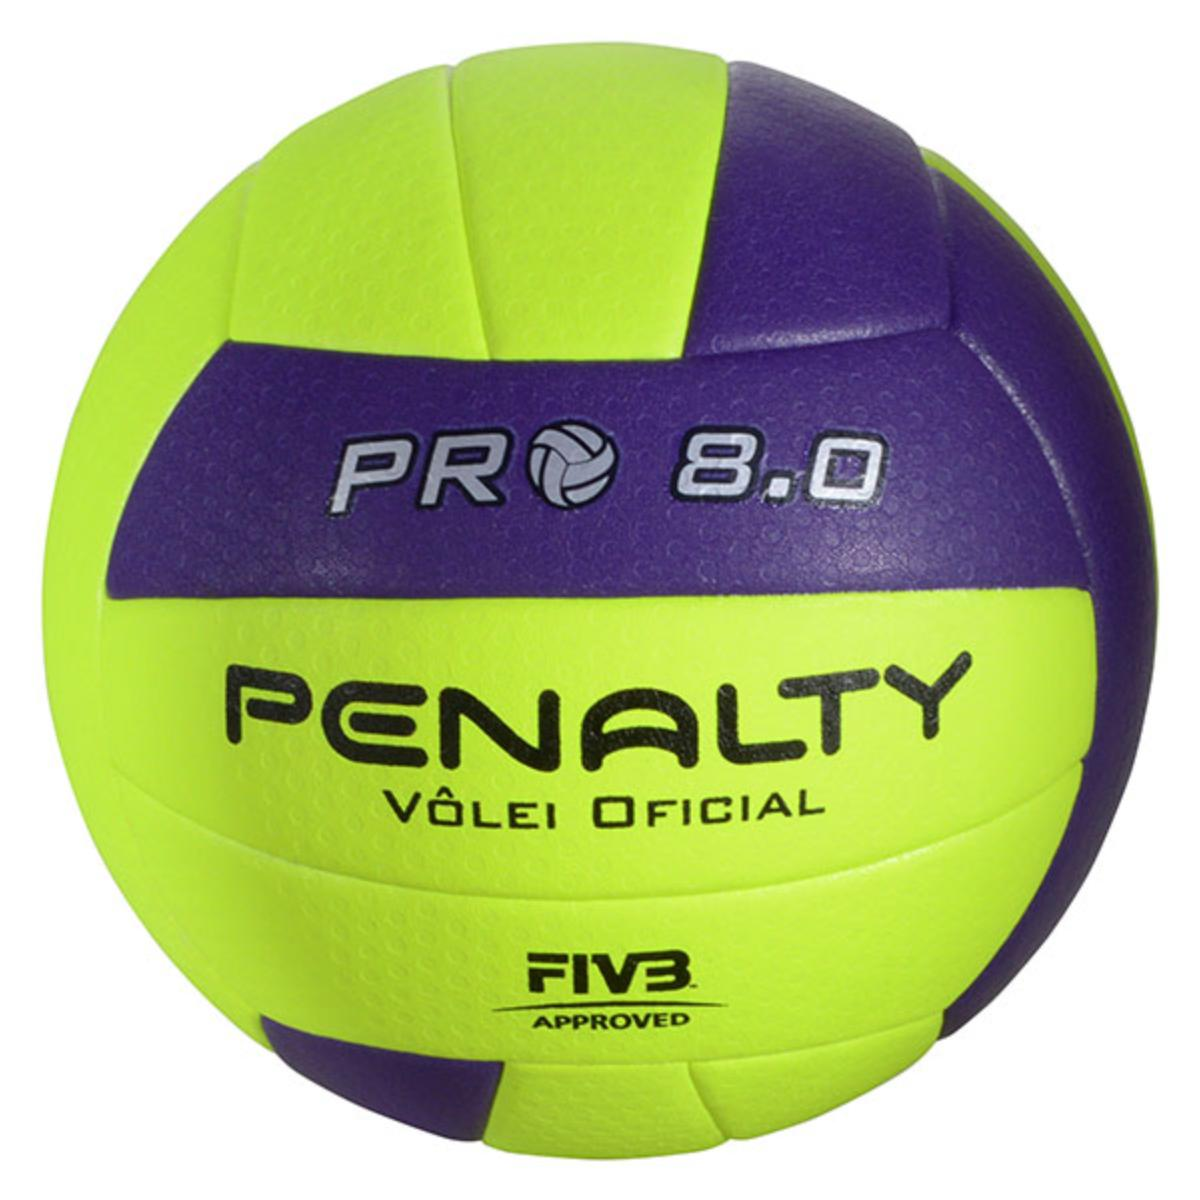 Bola Unisex Penalty 5415822400 8.0 Pro ix Limão/roxo